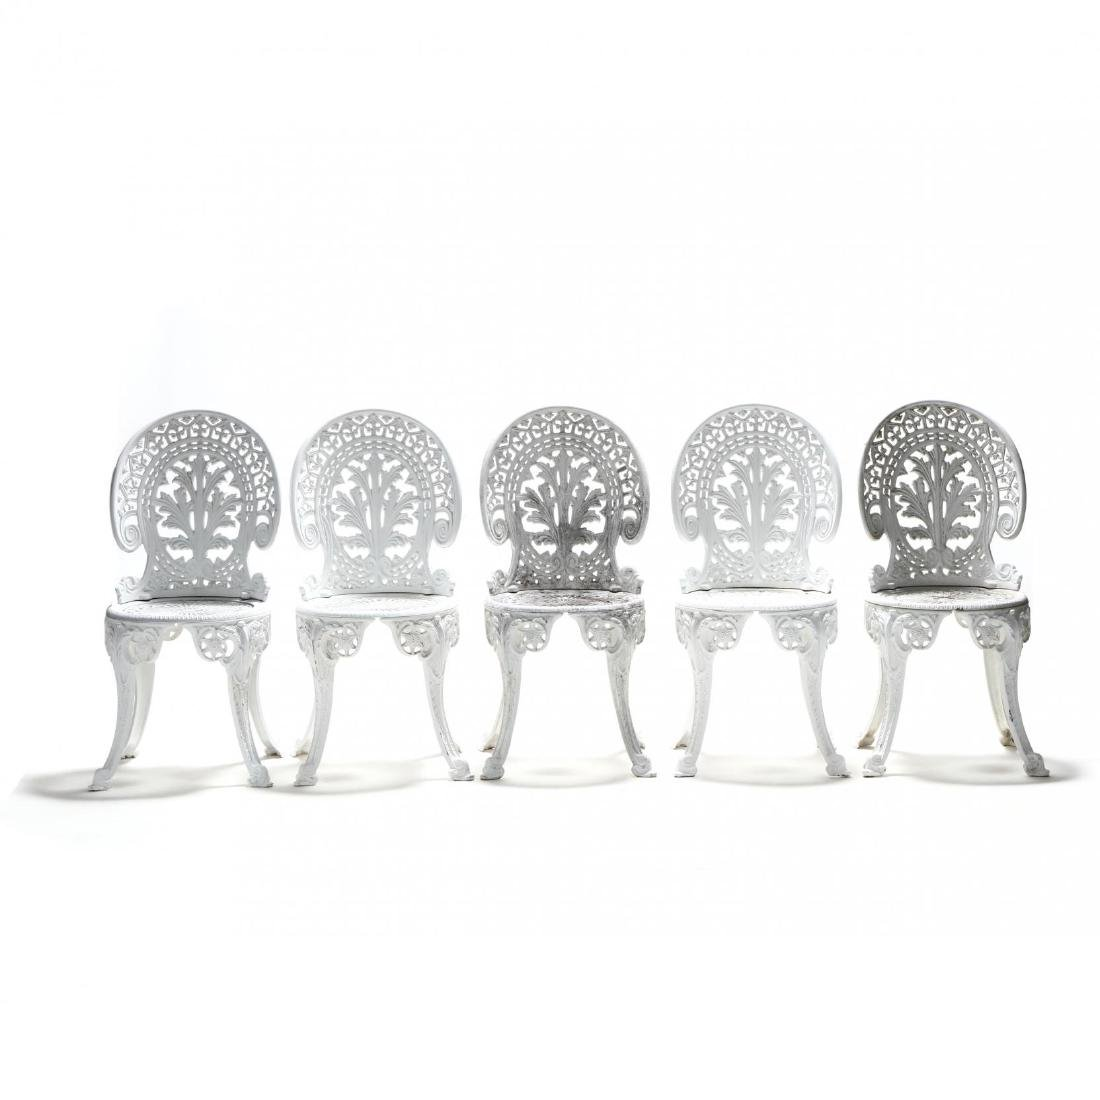 Twelve Piece Classical Style Cast Aluminum Garden Set - 3